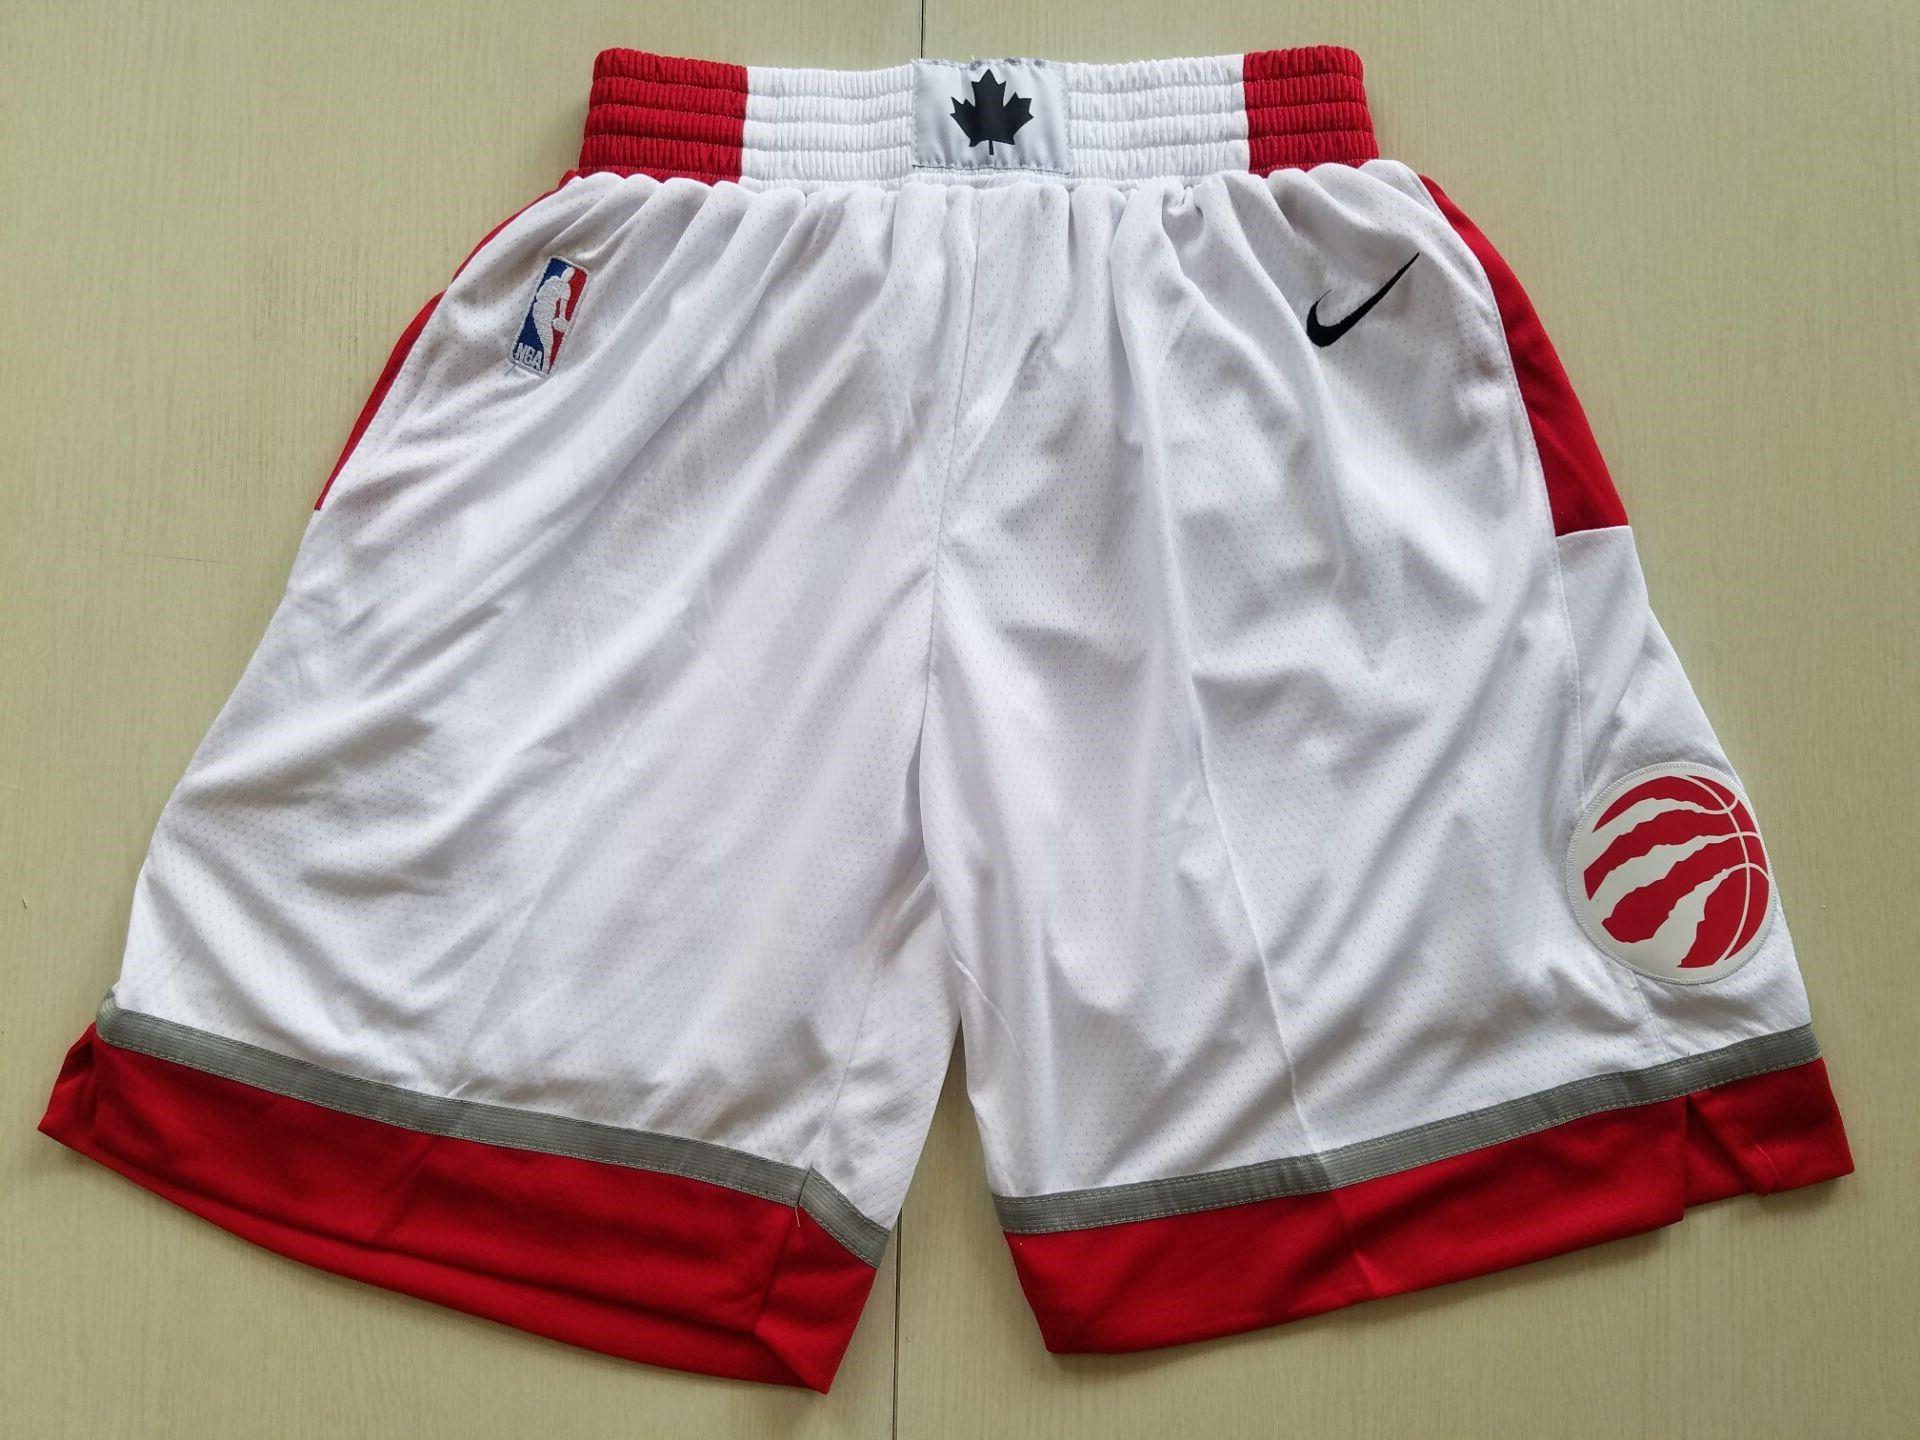 New Men/'s Toronto Raptors Kawhi Leonard Kyle Lowry Basketball pants shorts Red